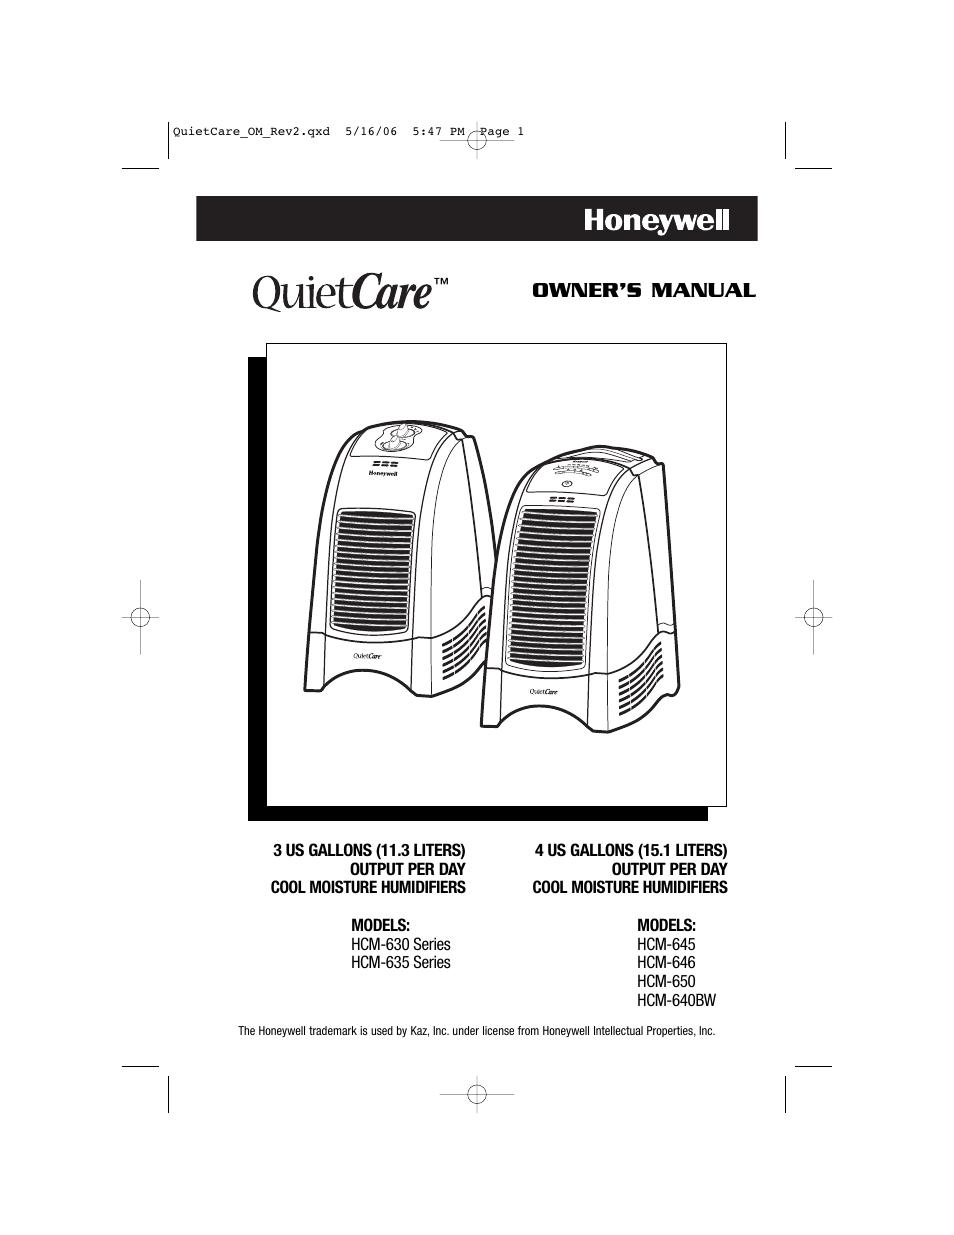 Honeywell HCM-635 User Manual | 36 pages | Also for: HCM-646, HCM-640BW,  HCM-645, HCM-650, HCM-630